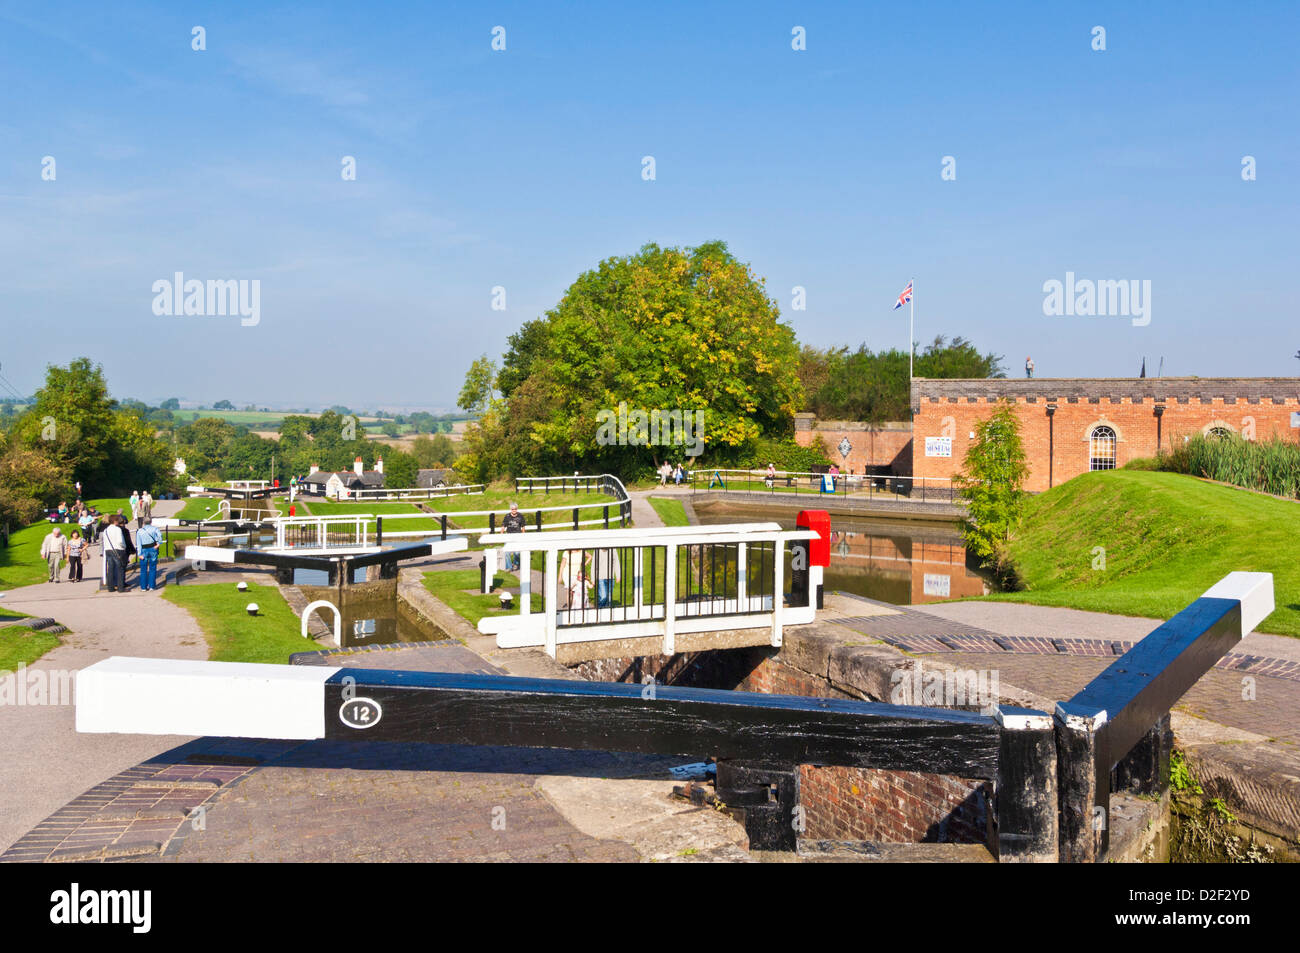 Historic Flight of locks at Foxton locks on the grand union canal Leicestershire England UK GB EU Europe - Stock Image